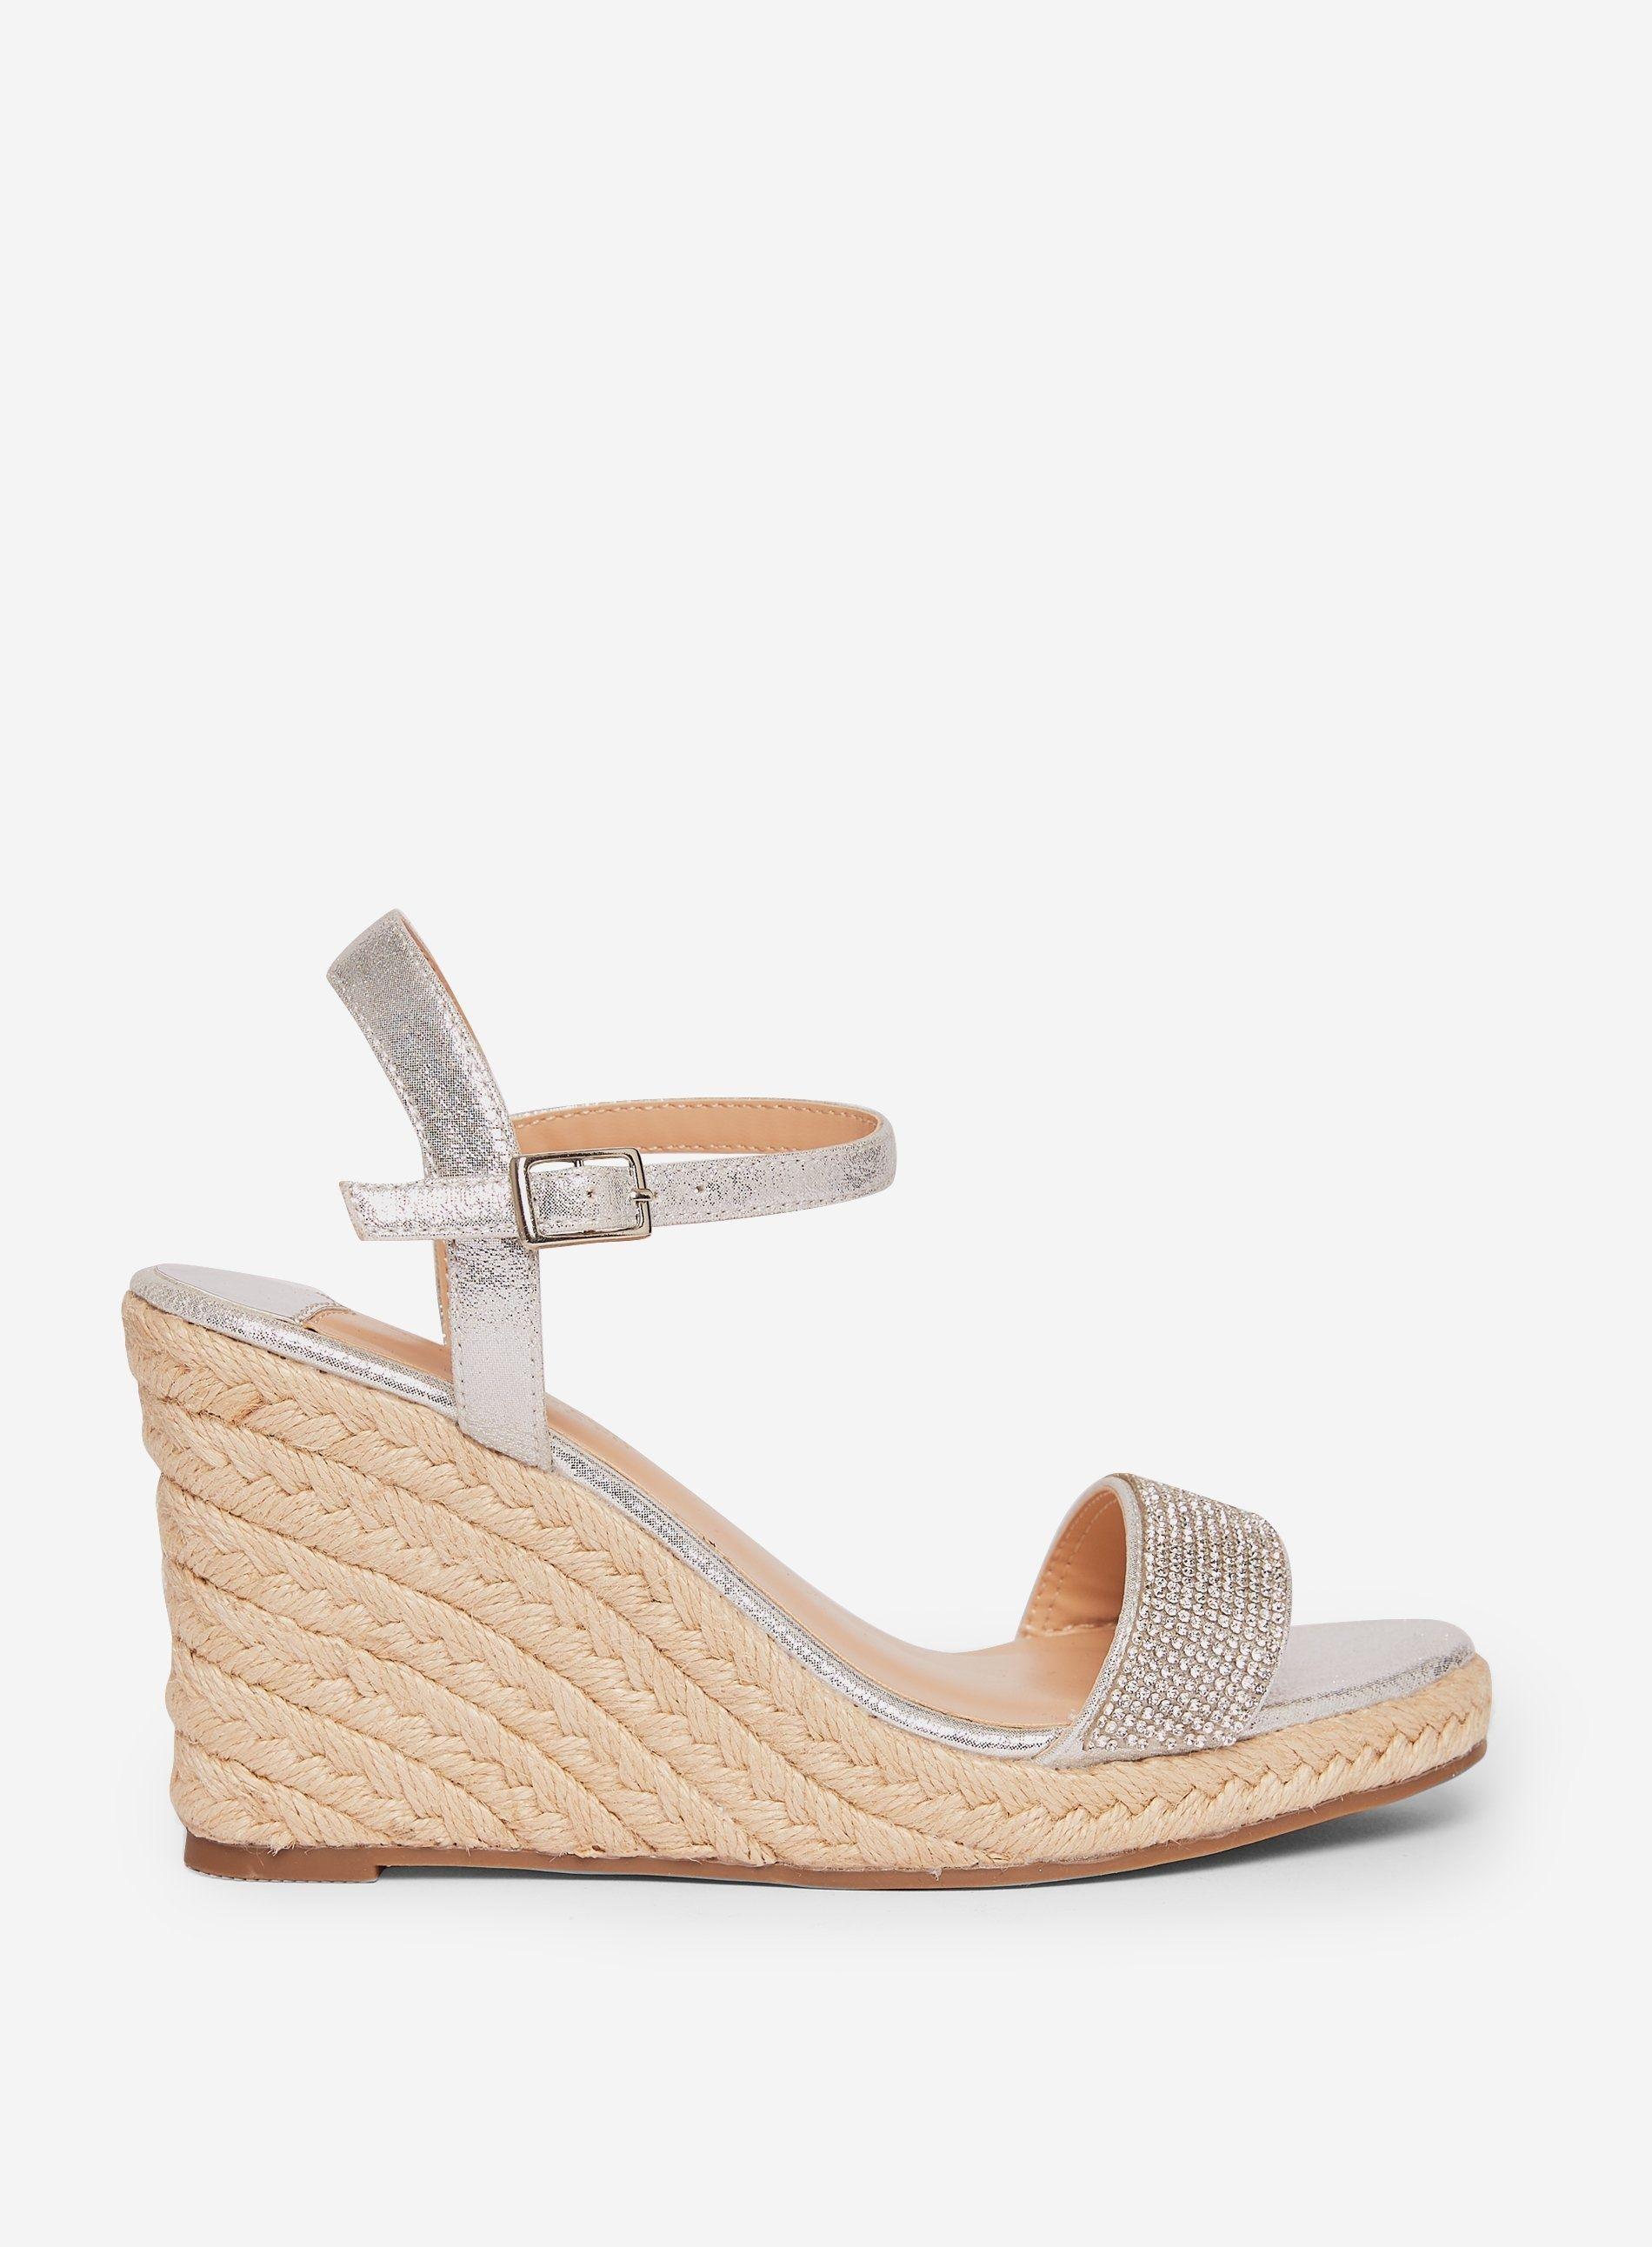 Dorothy Perkins Womens Grey Raa Raa Wedge Sandals Open Toe Heels Buckle Shoes